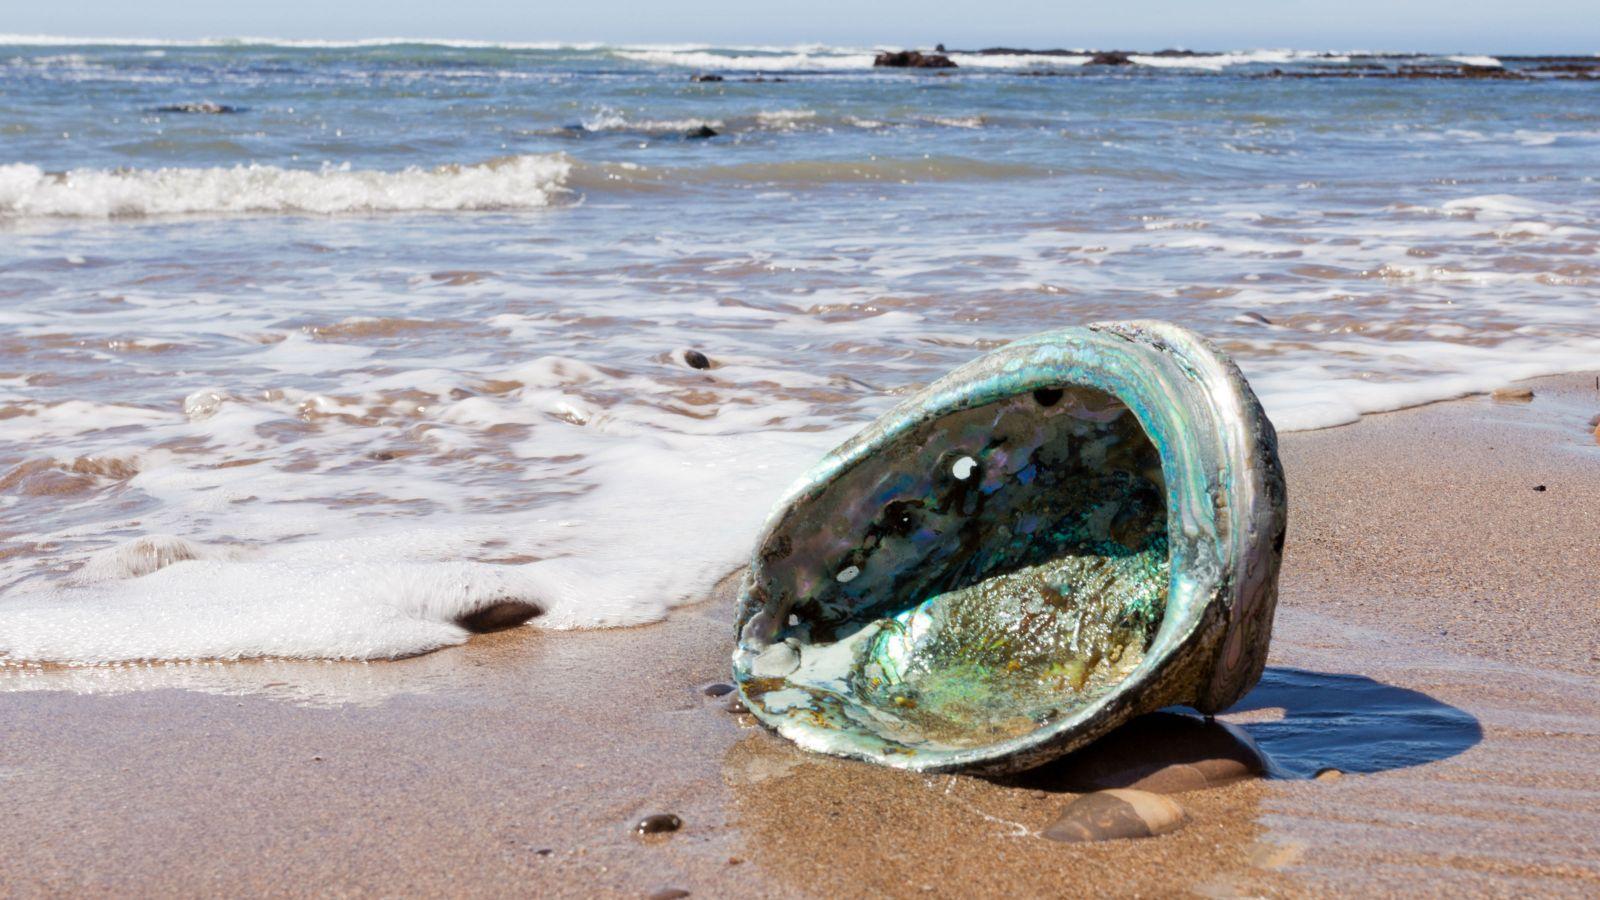 Empty shell on beach